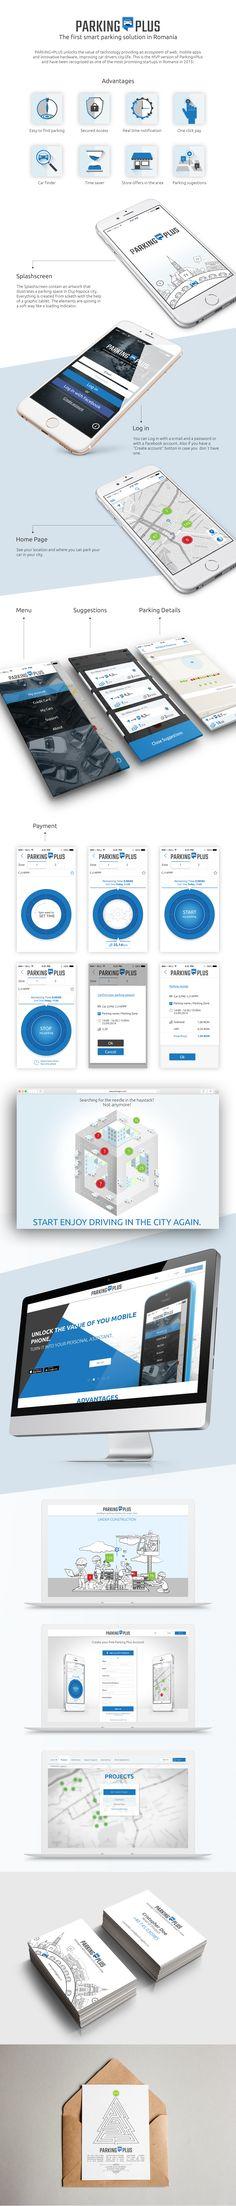 "Check out my @Behance project: ""Parking Plus -  Mobile UI/UX design / Mobile App"" https://www.behance.net/gallery/45660833/Parking-Plus-Mobile-UIUX-design-Mobile-App"